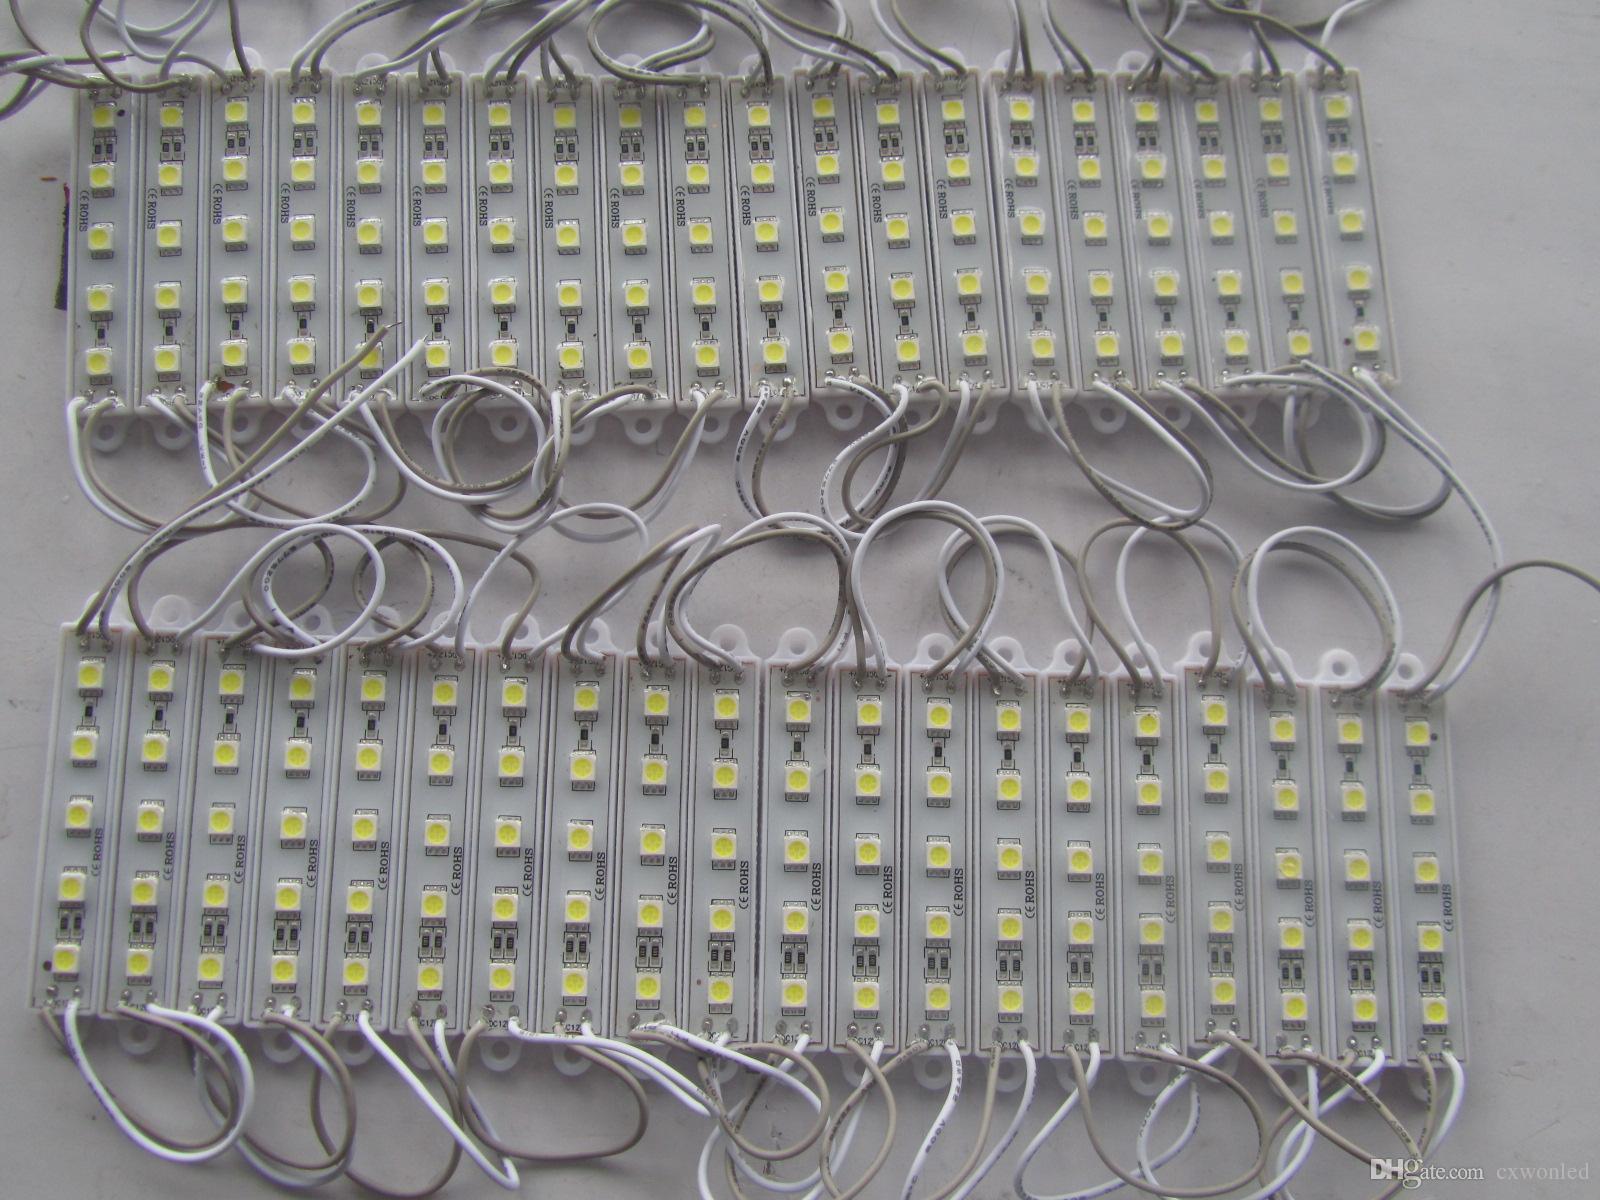 backlight Led Module For Billboard LED sign modules Christmas lamp light 5050 5 LED RGB Green Red Blue Warm White Waterproof DC 12V